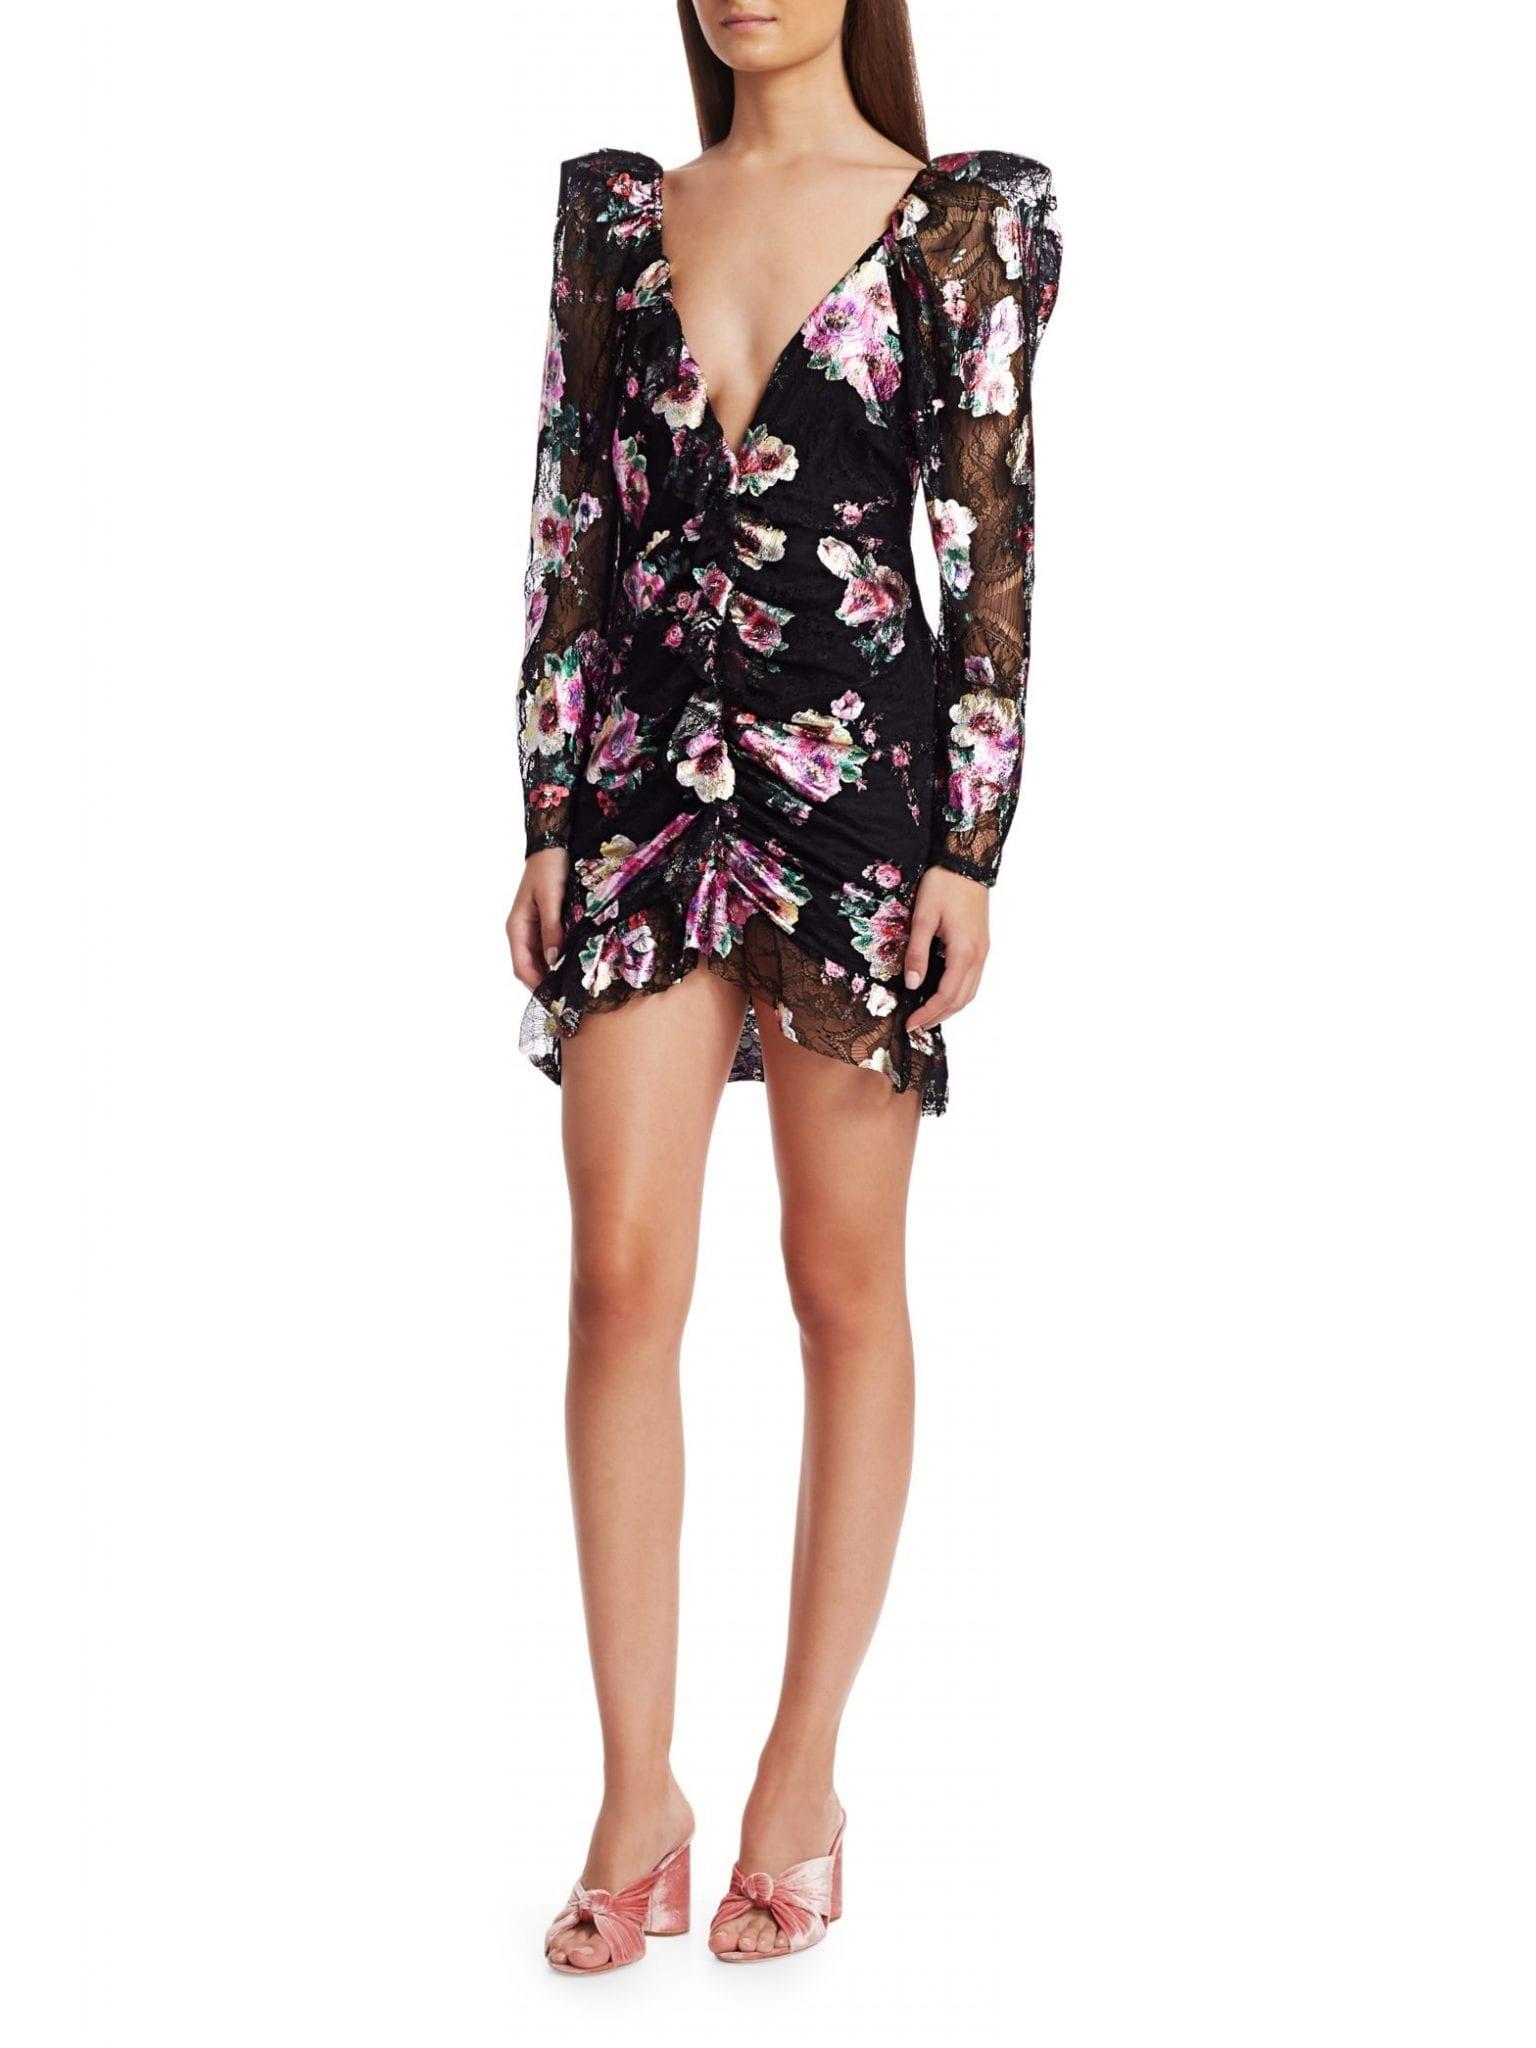 FOR LOVE & LEMONS Benatar Open Back Ruffled Lace Mini Dress